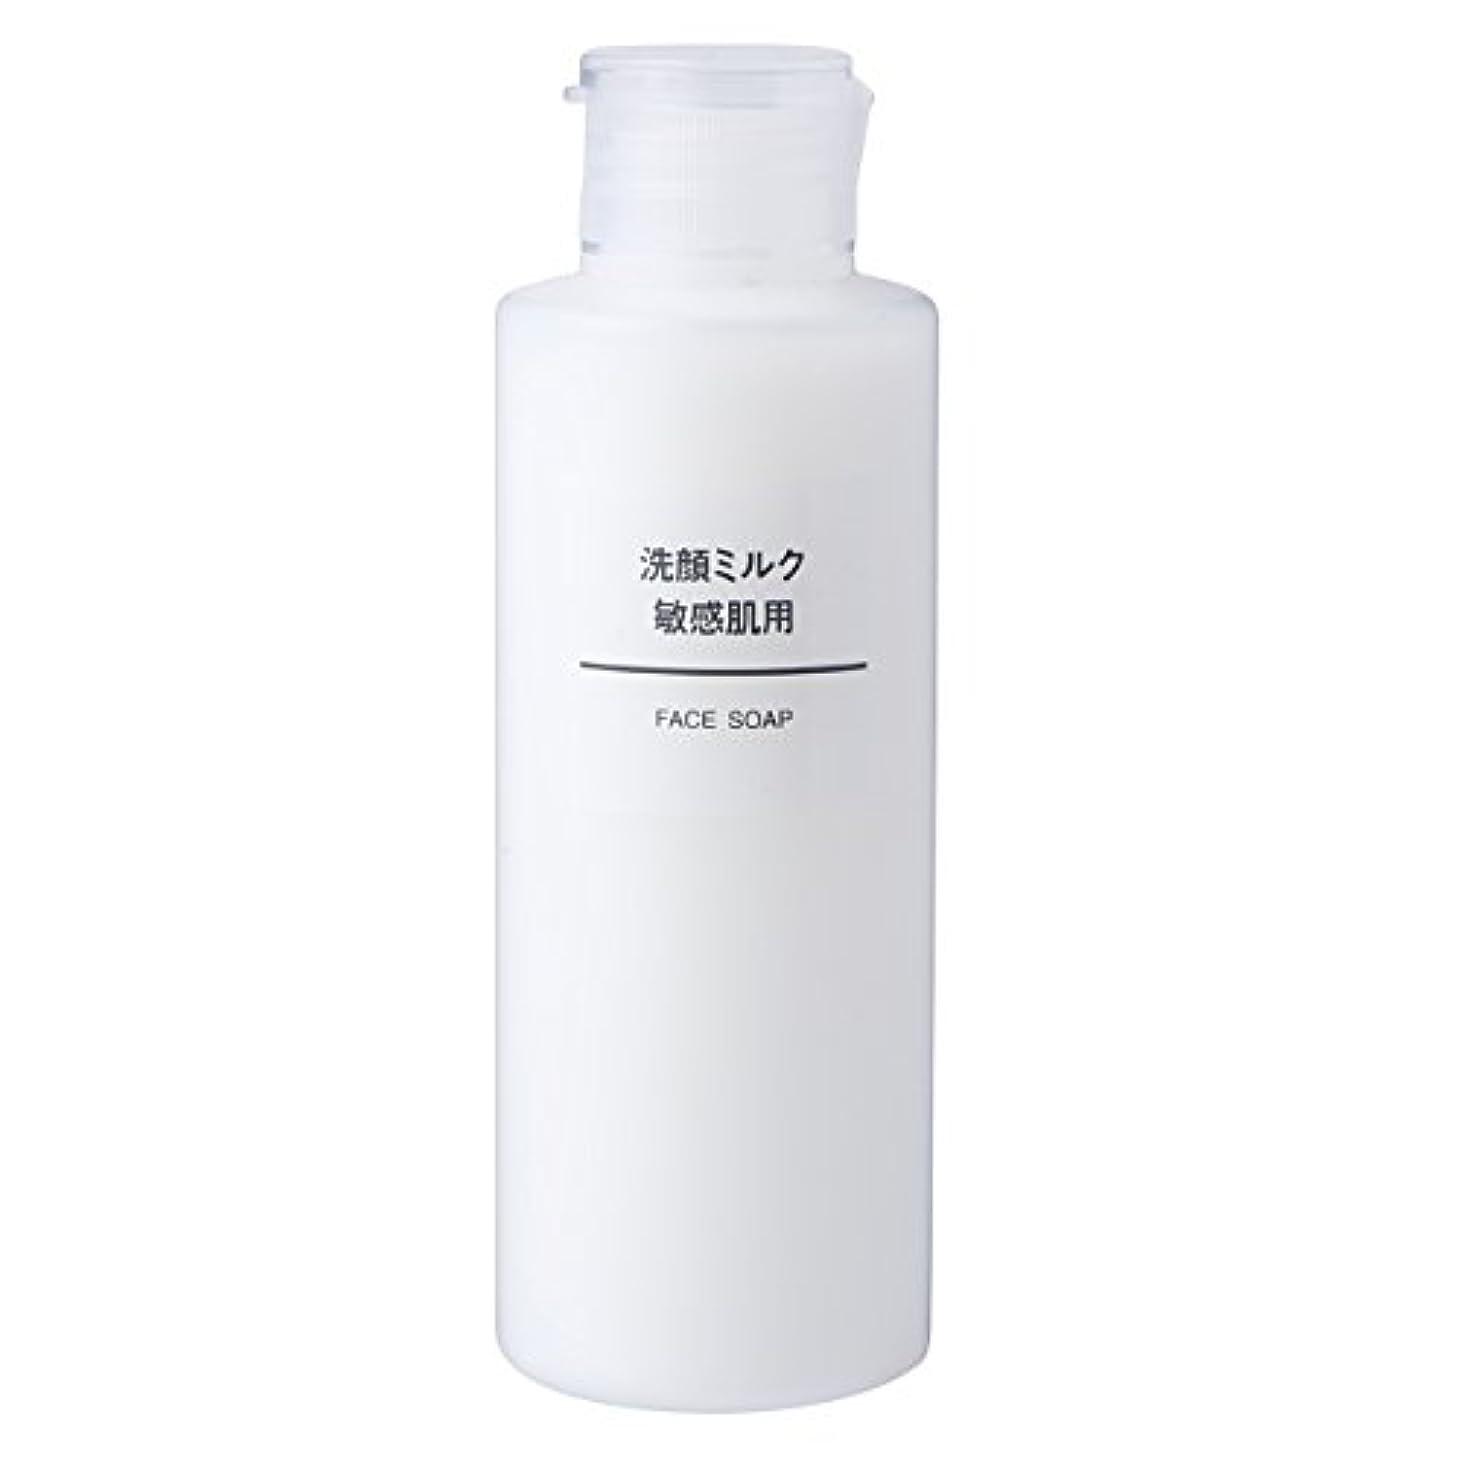 商人脱獄通行料金無印良品 洗顔ミルク 敏感肌用 150ml